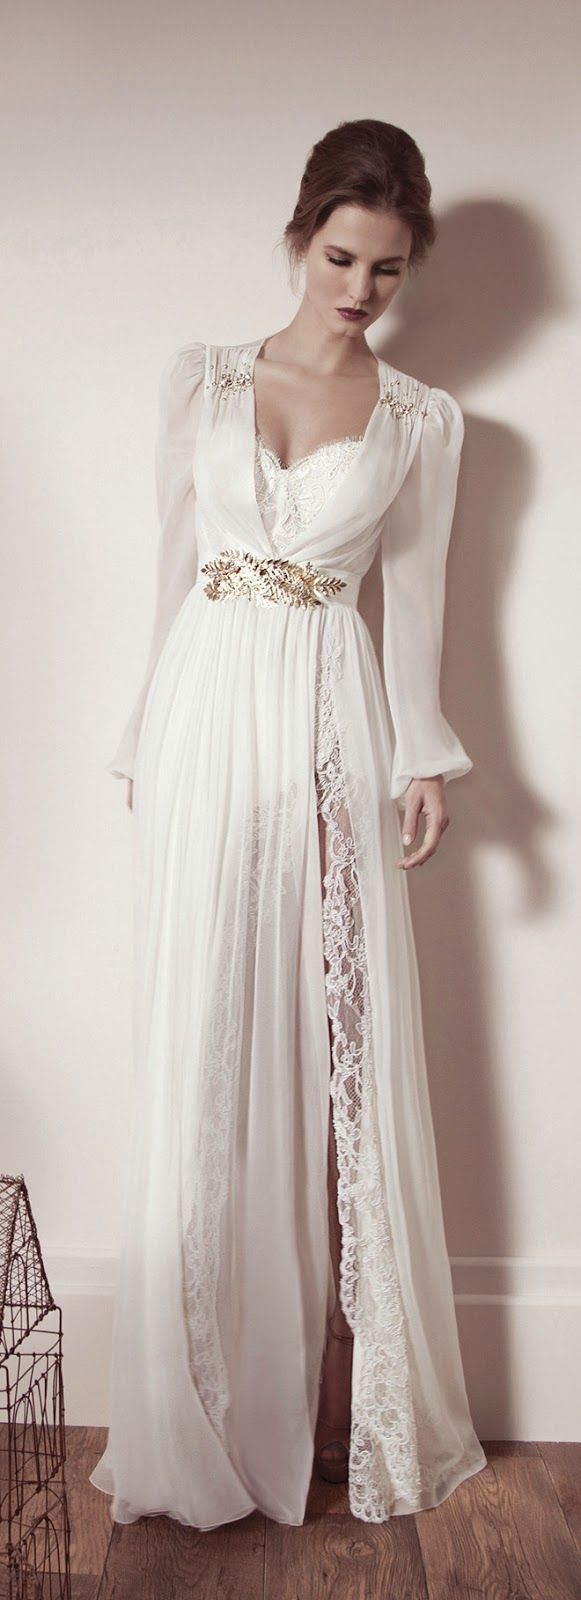 Lihi Hod 2013 Bridal Collection | bellethemagazine.com www.ouihours.com